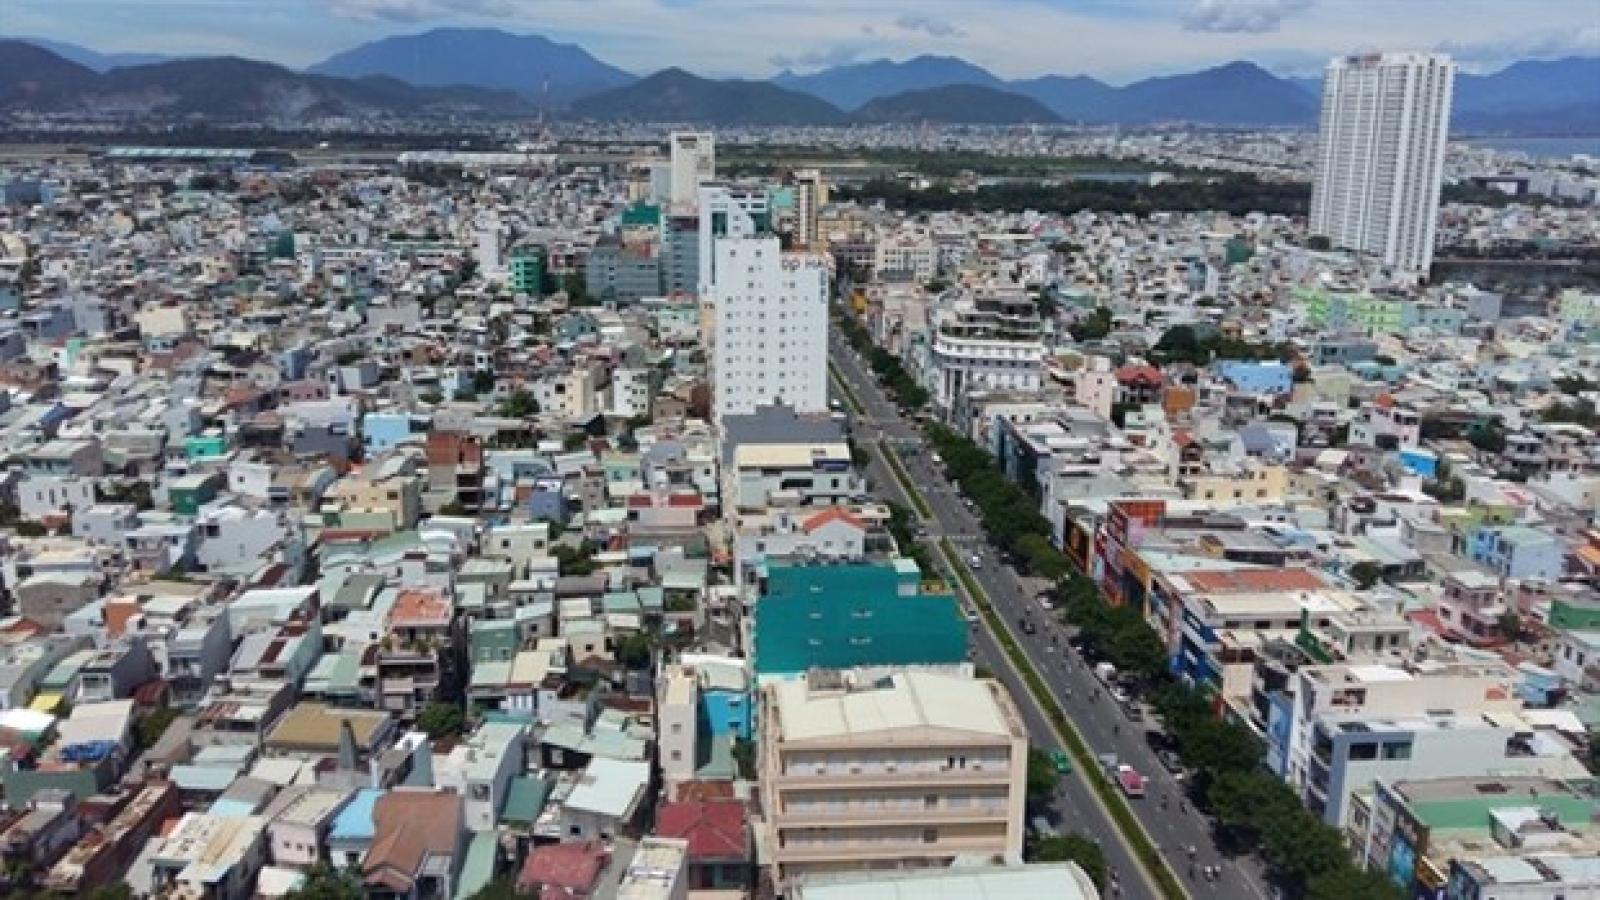 Da Nang, UNDP work towards smart, green and inclusive city